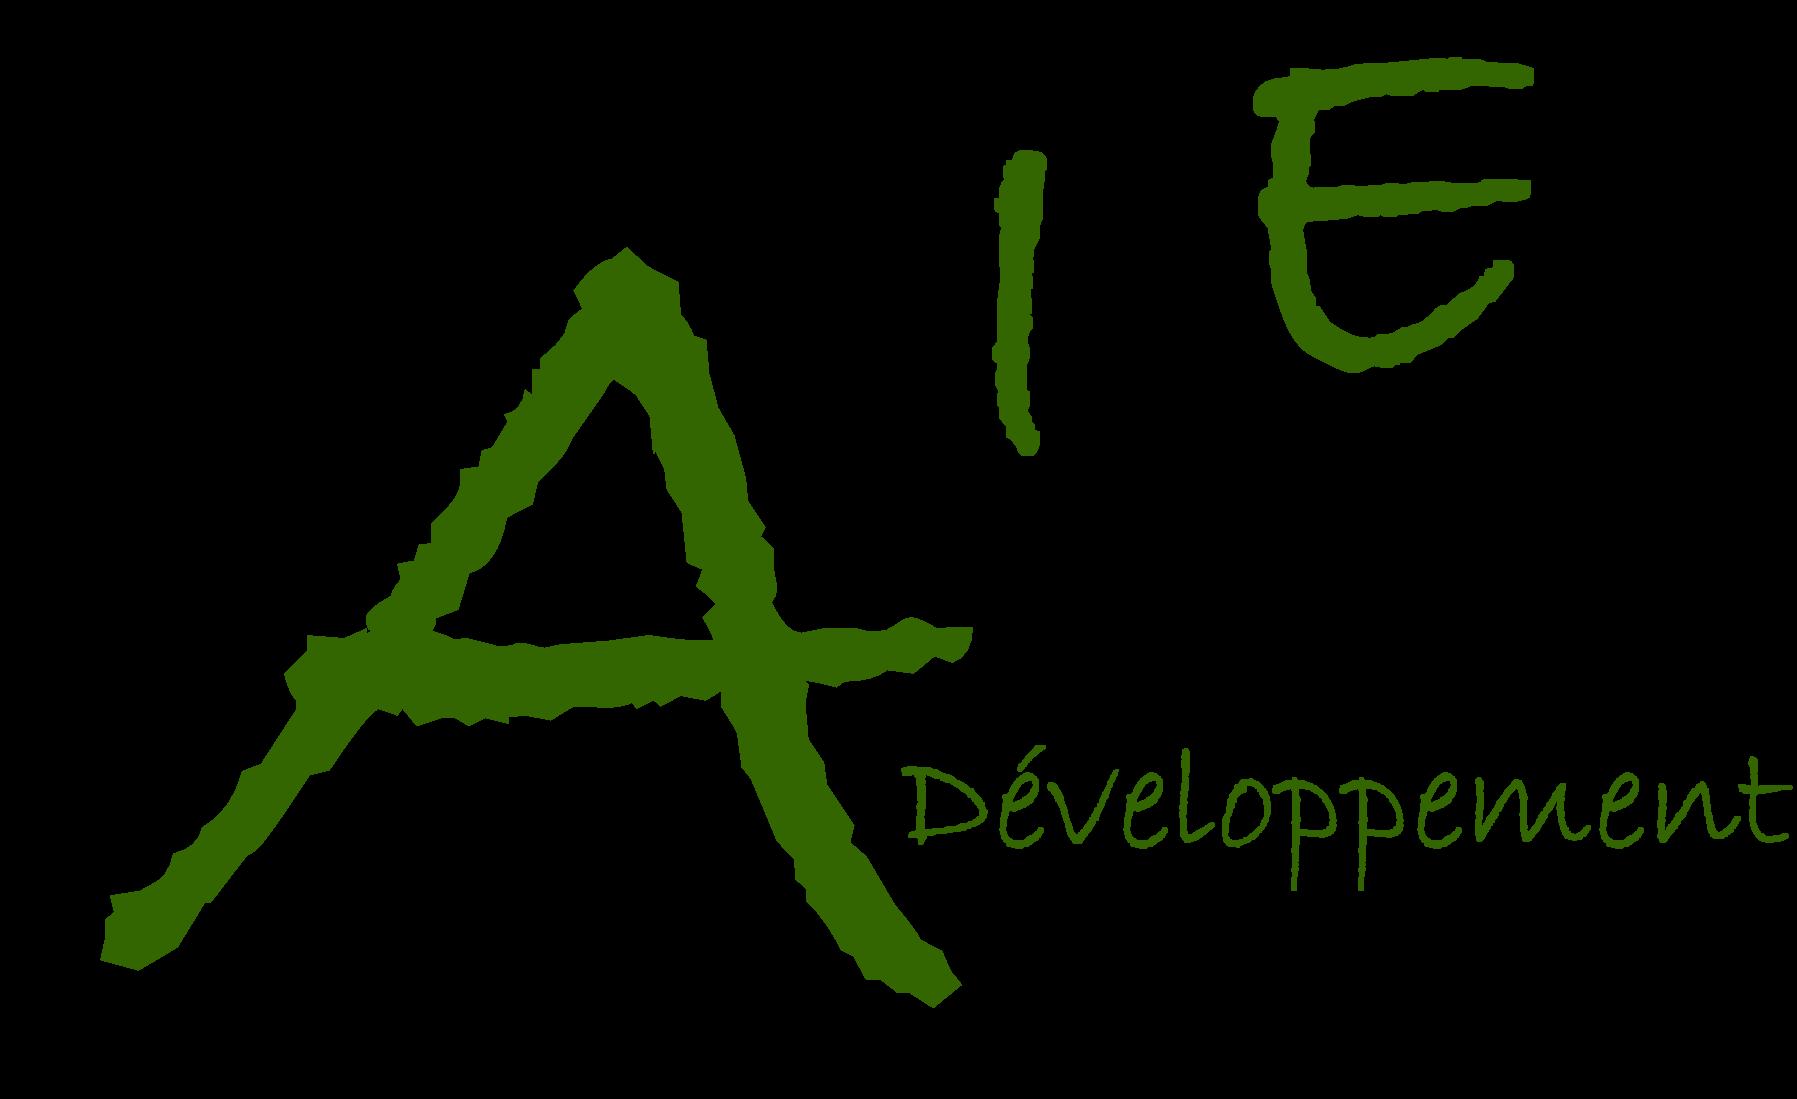 Logo aied